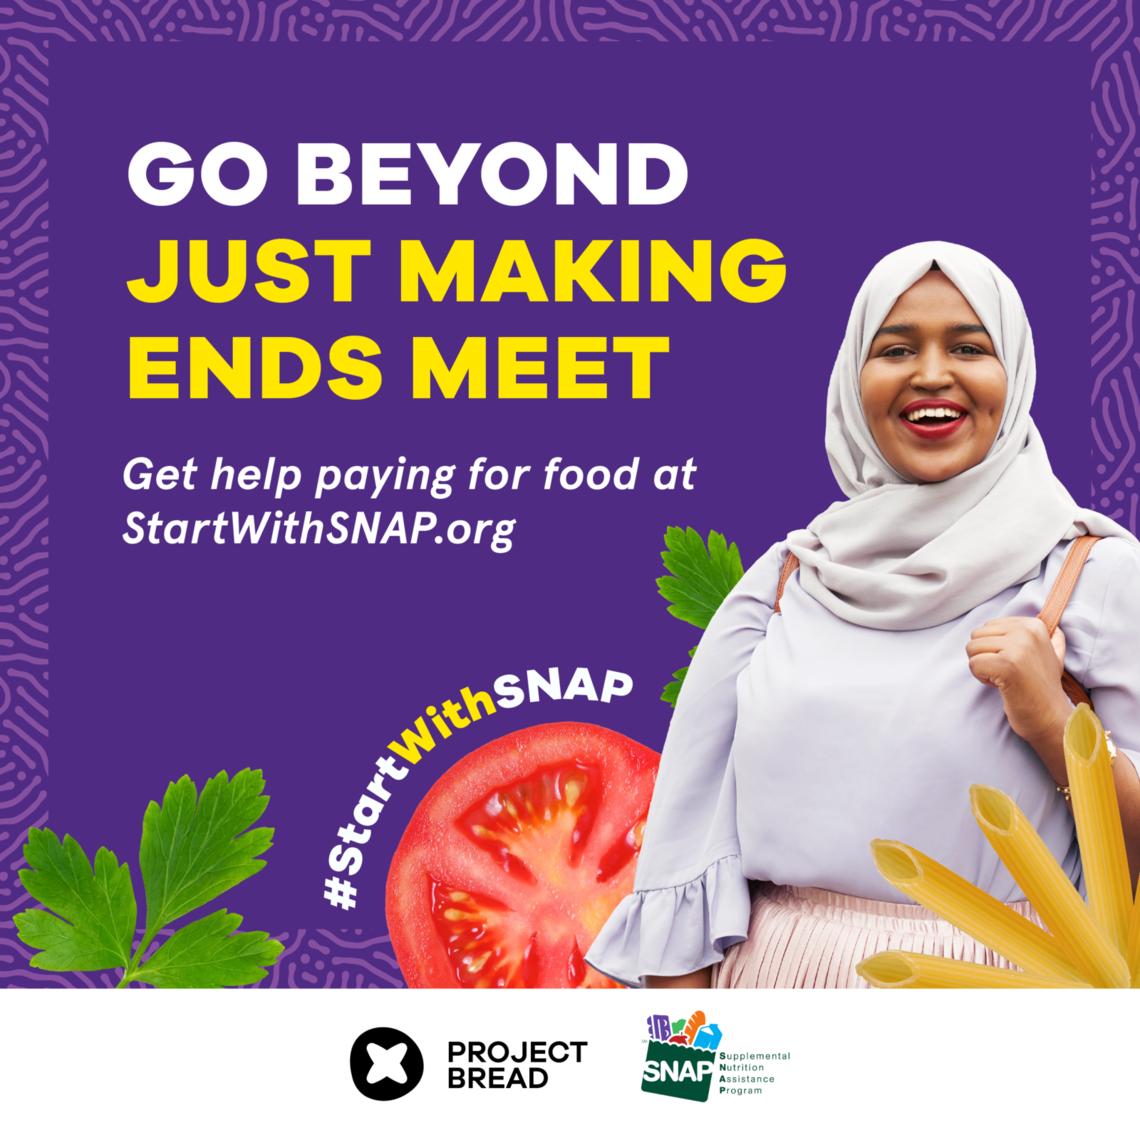 Instagram post for #StartWithSNAP